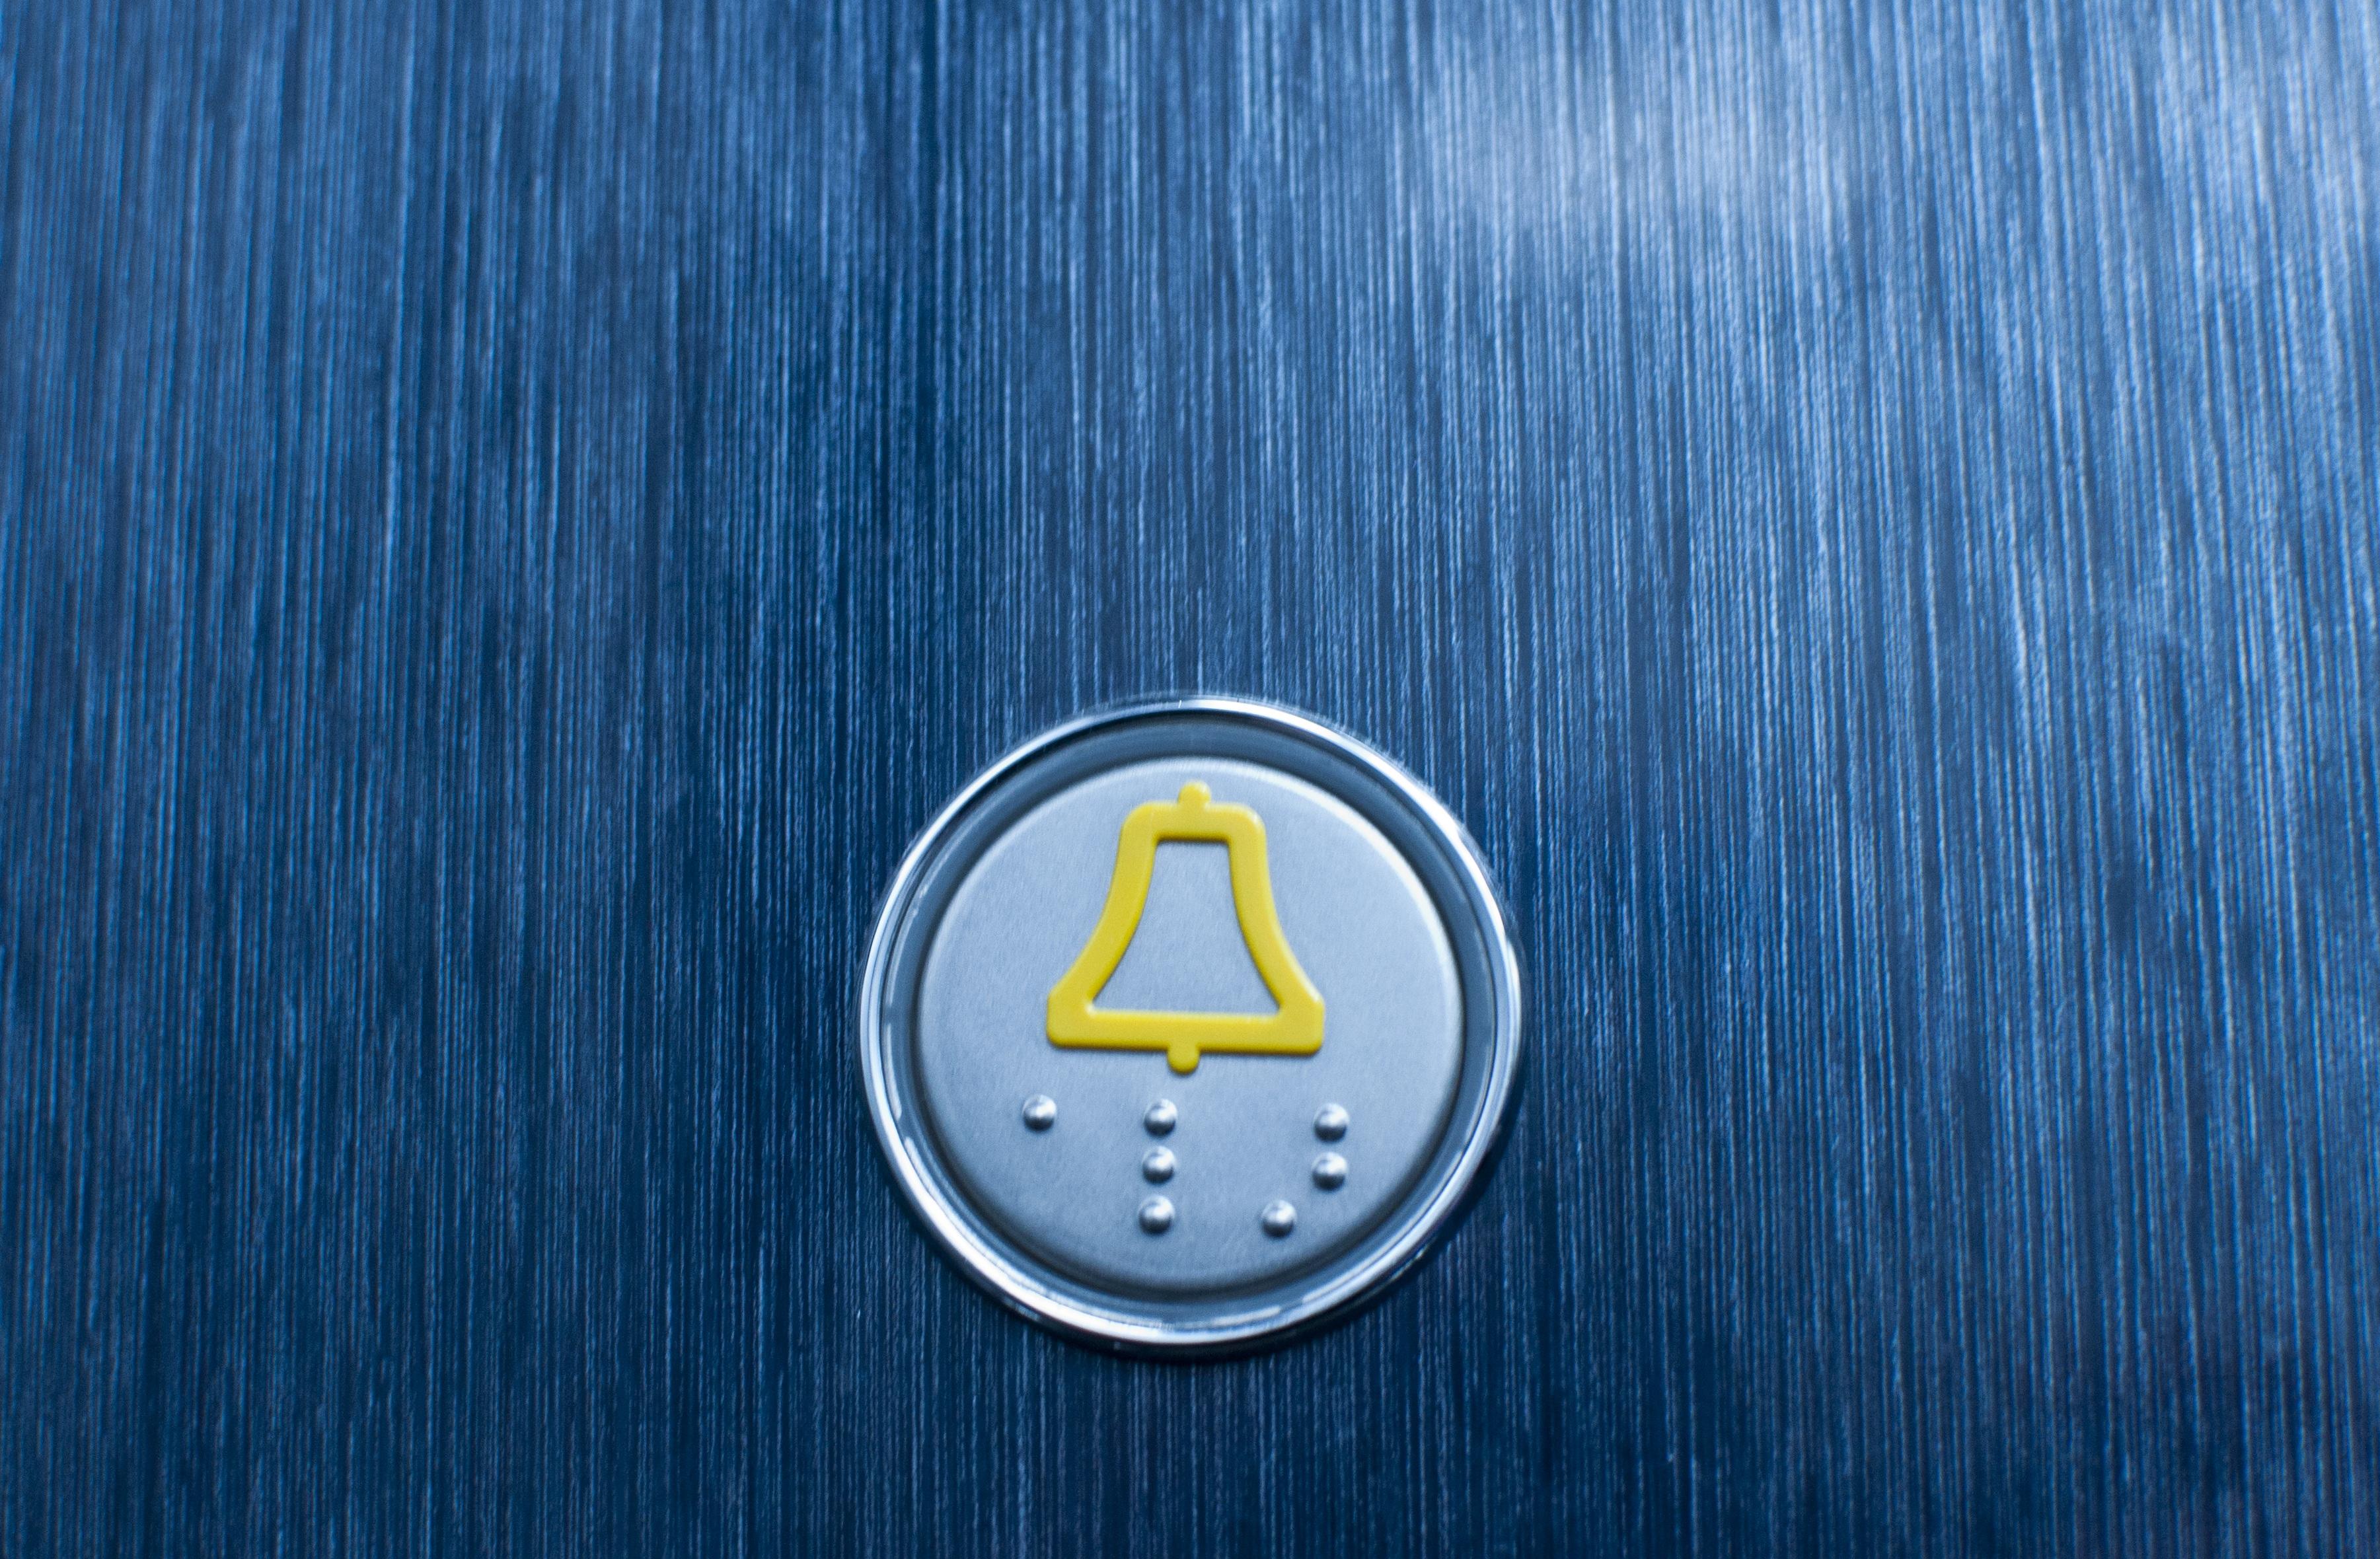 yellow lift alarm button